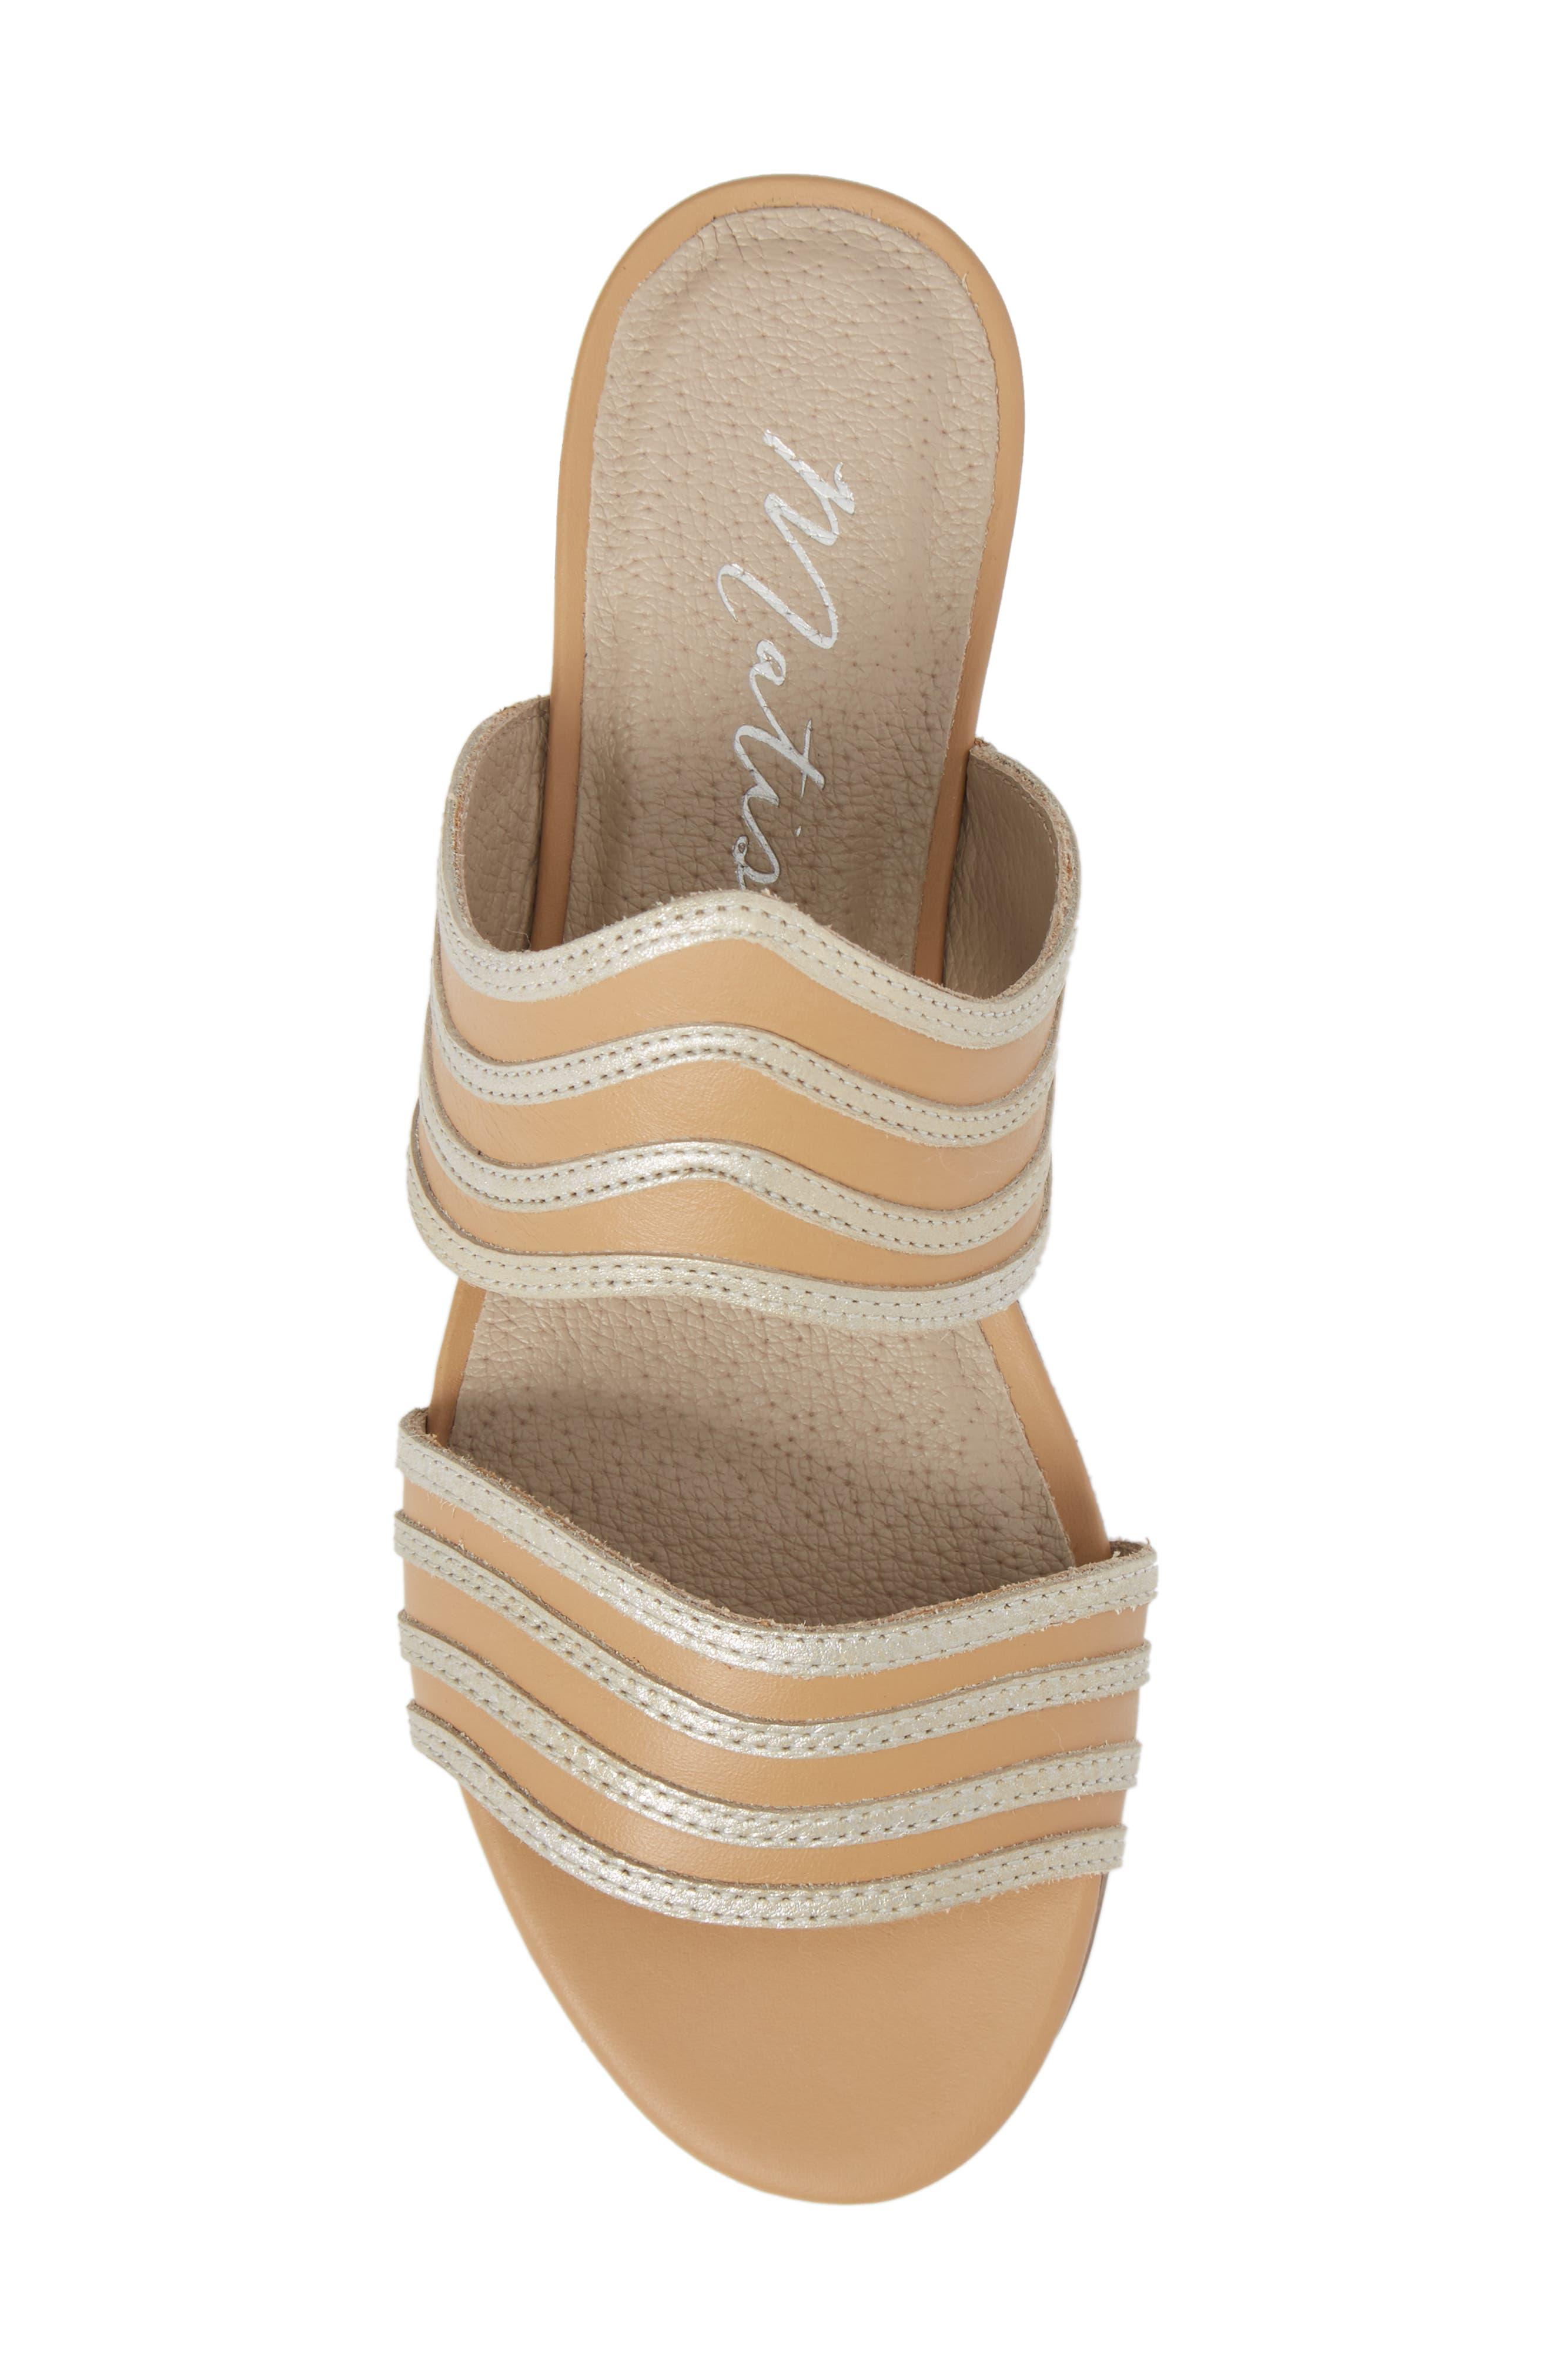 Russo Slide Sandal,                             Alternate thumbnail 5, color,                             Natural/ Silver Leather